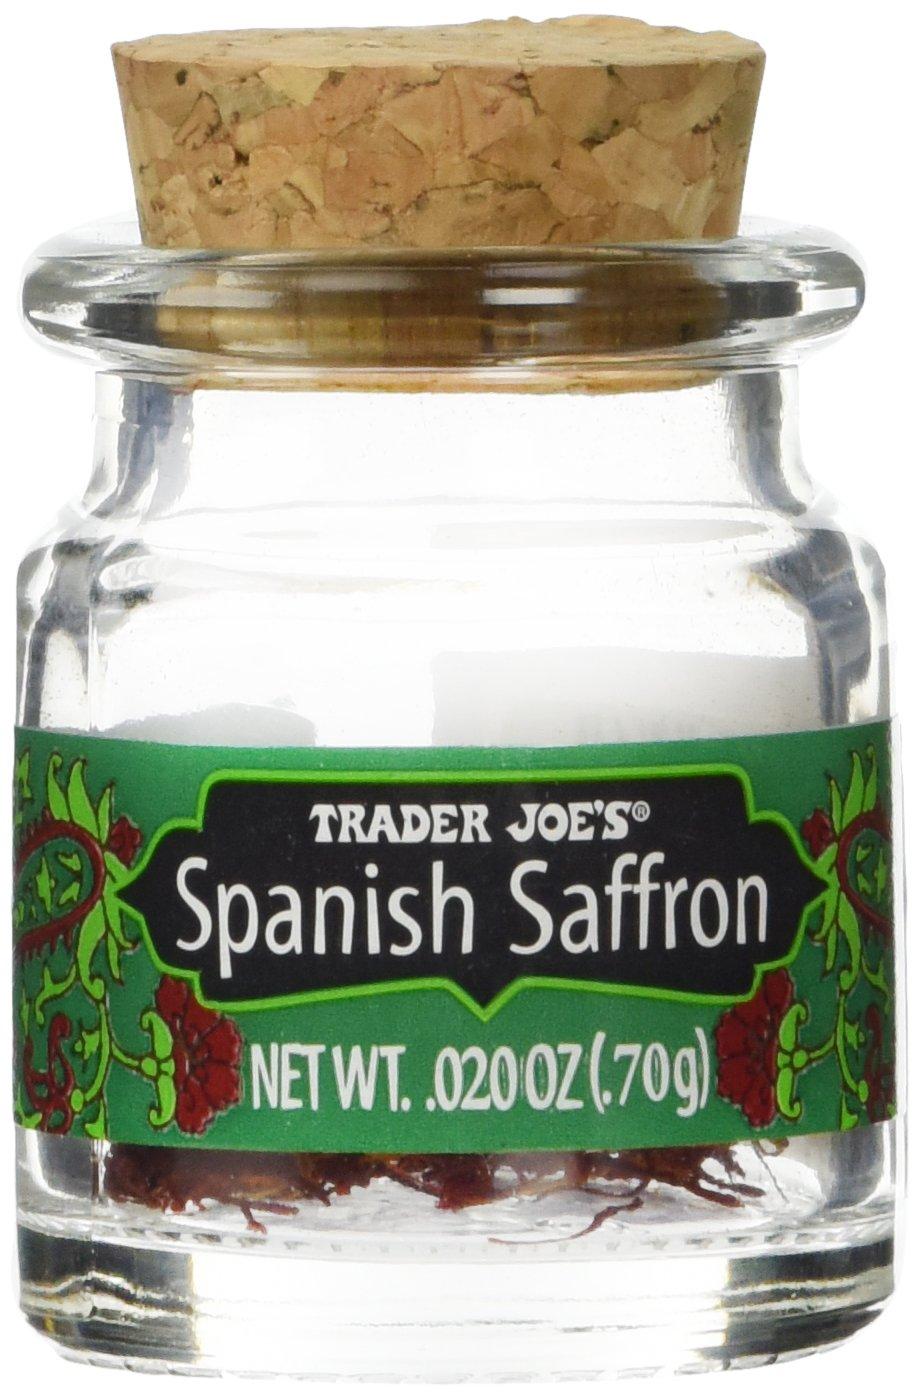 Trader Joe's Spanish Saffron Spice, .02 oz